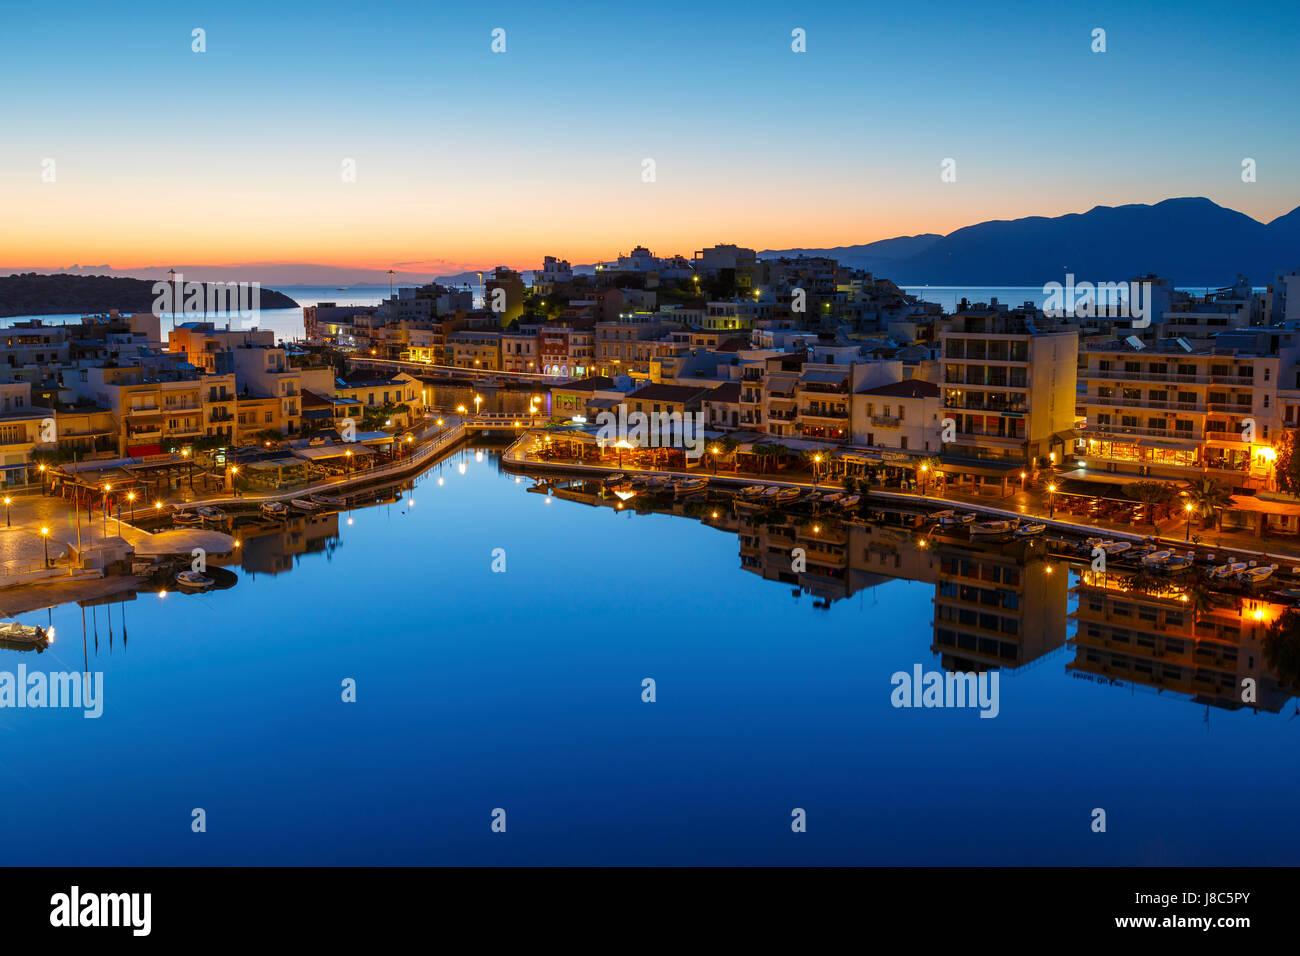 View of Agios Nikolaos and its harbor, Crete, Greece. - Stock Image